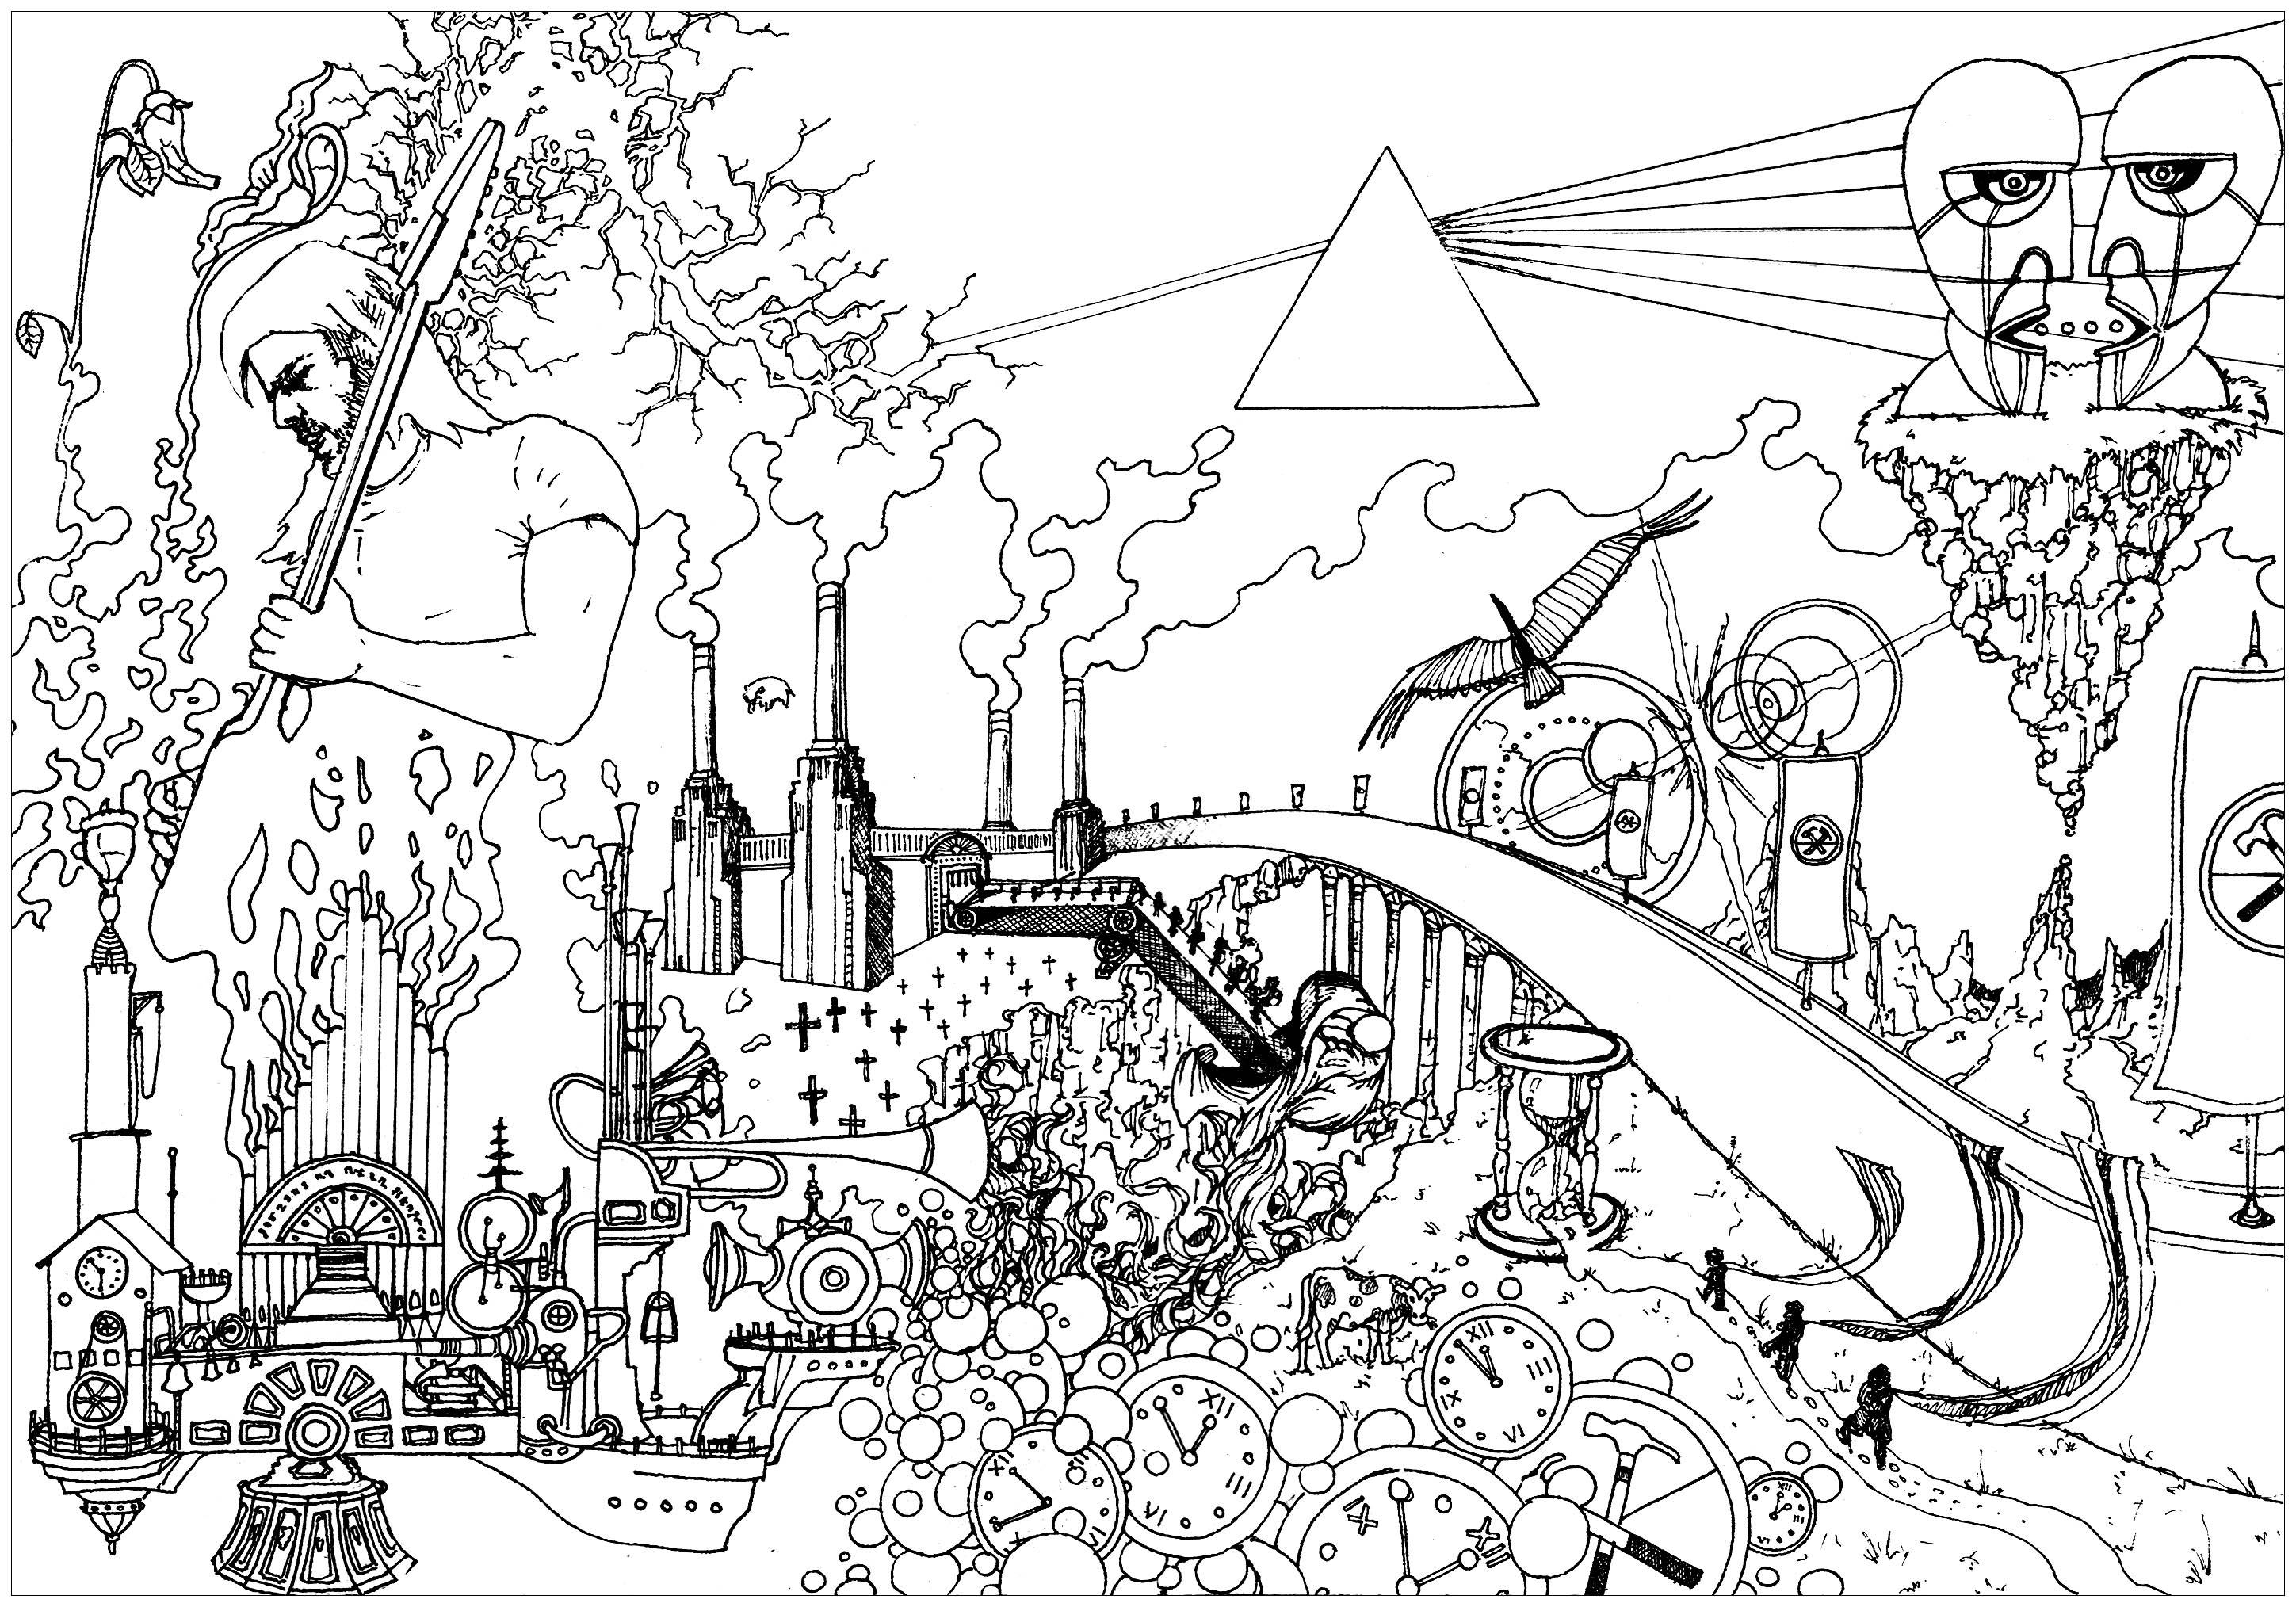 Source https johnlanthier wordpress com 2011 01 06 artwork